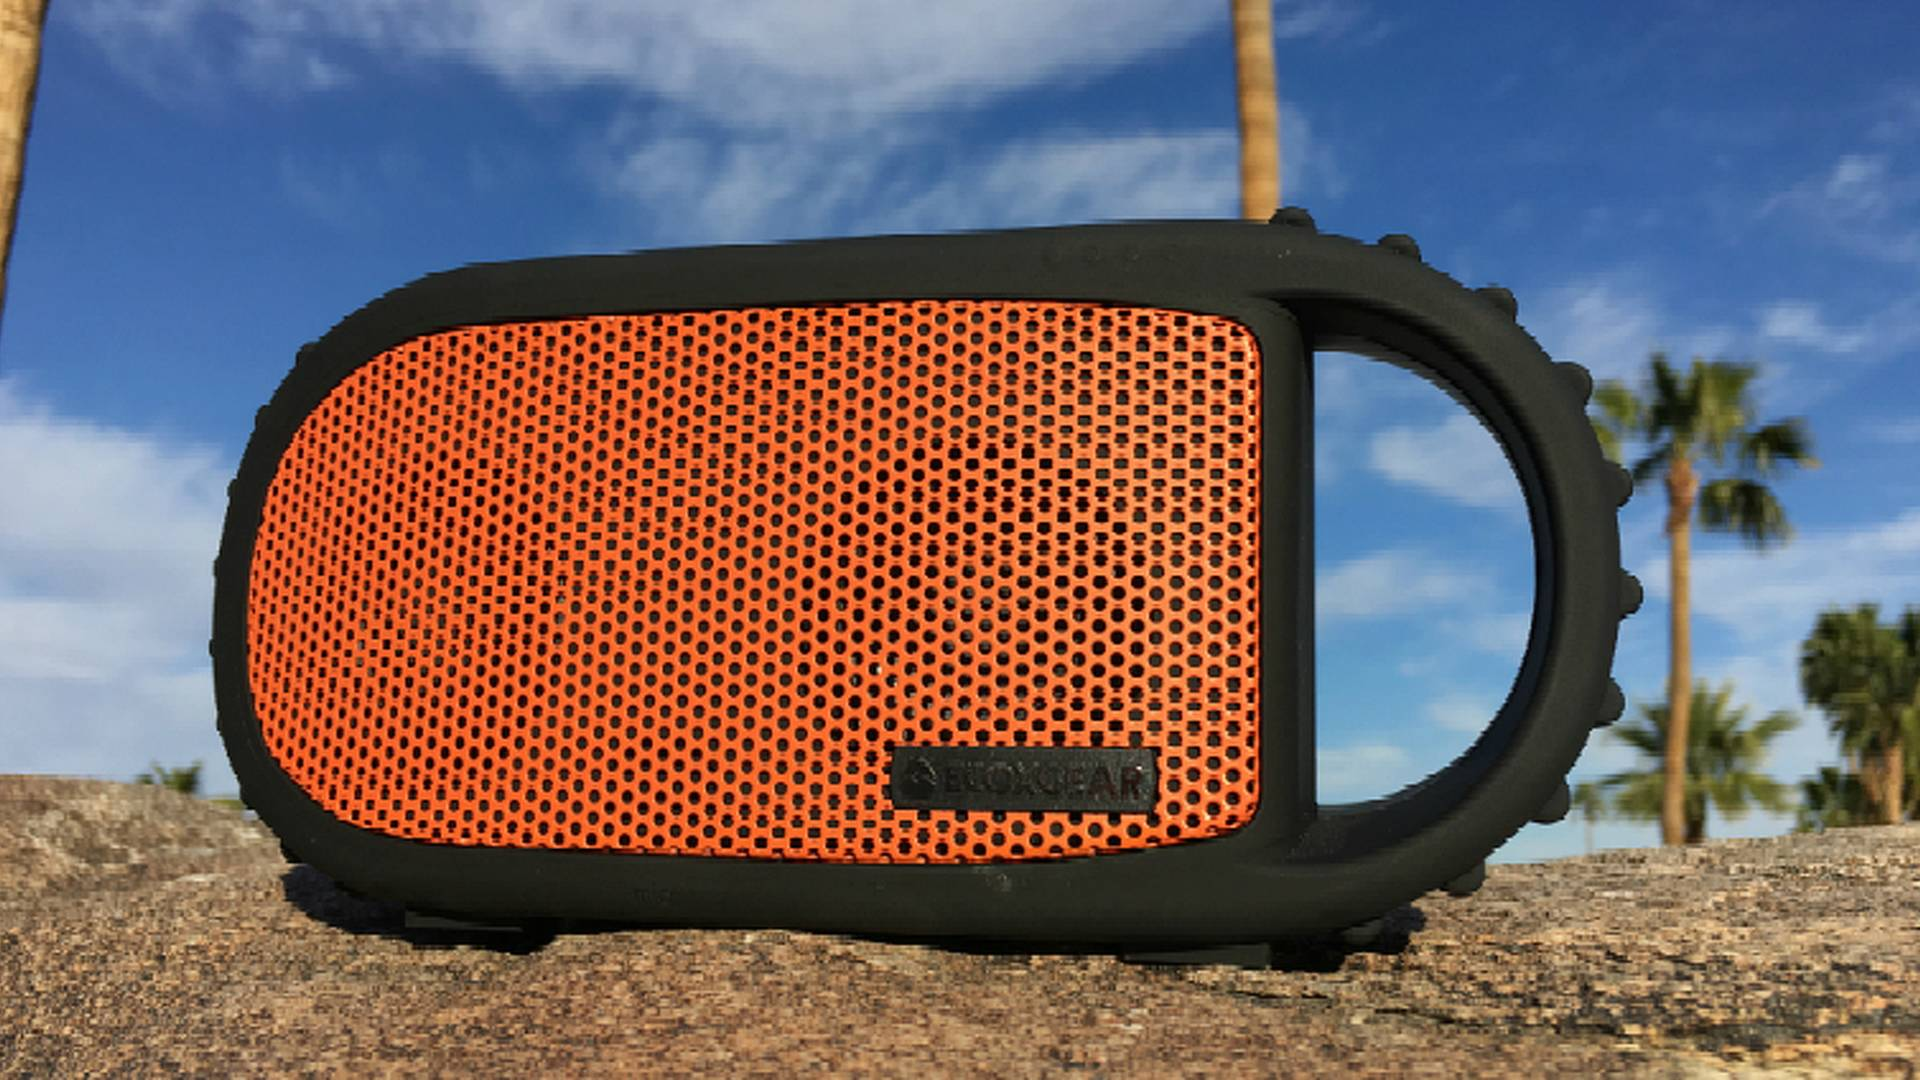 Floats ECOXGEAR ECOCARBON IPx68 Rated Waterproof Wireless Bluetooth Speaker